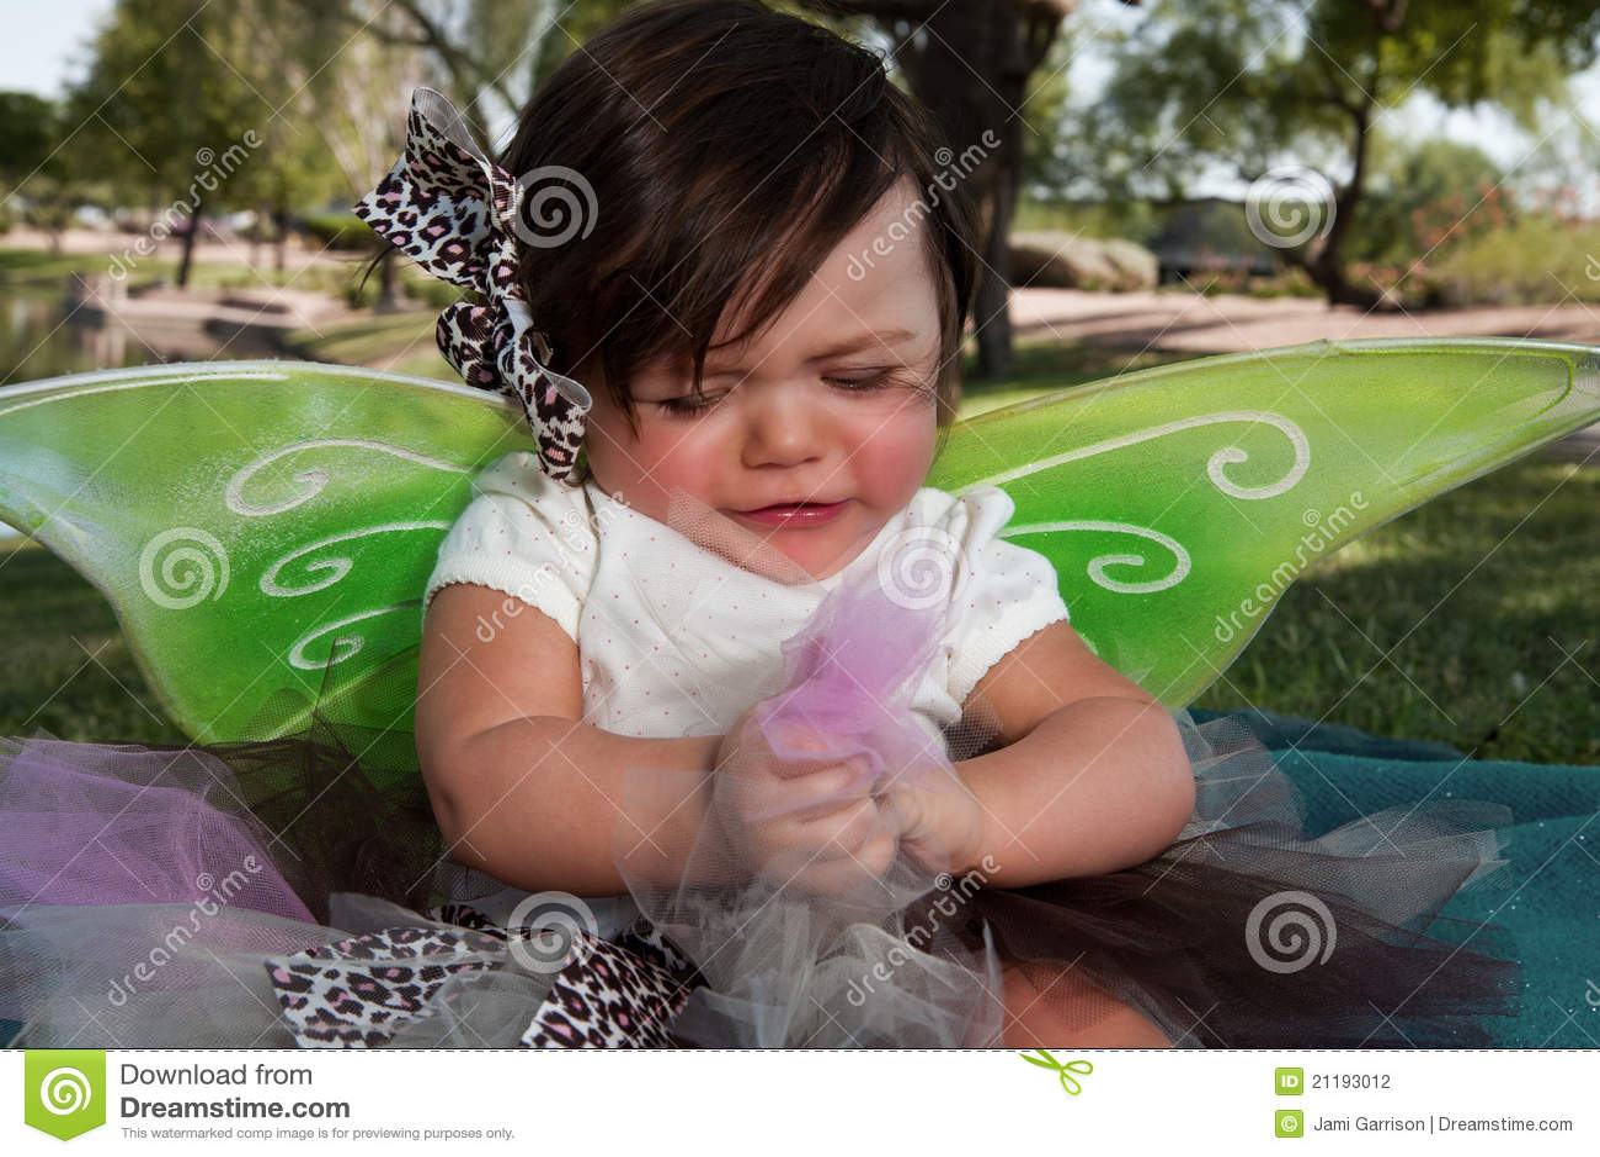 Sad Baby Girl wearing Wings